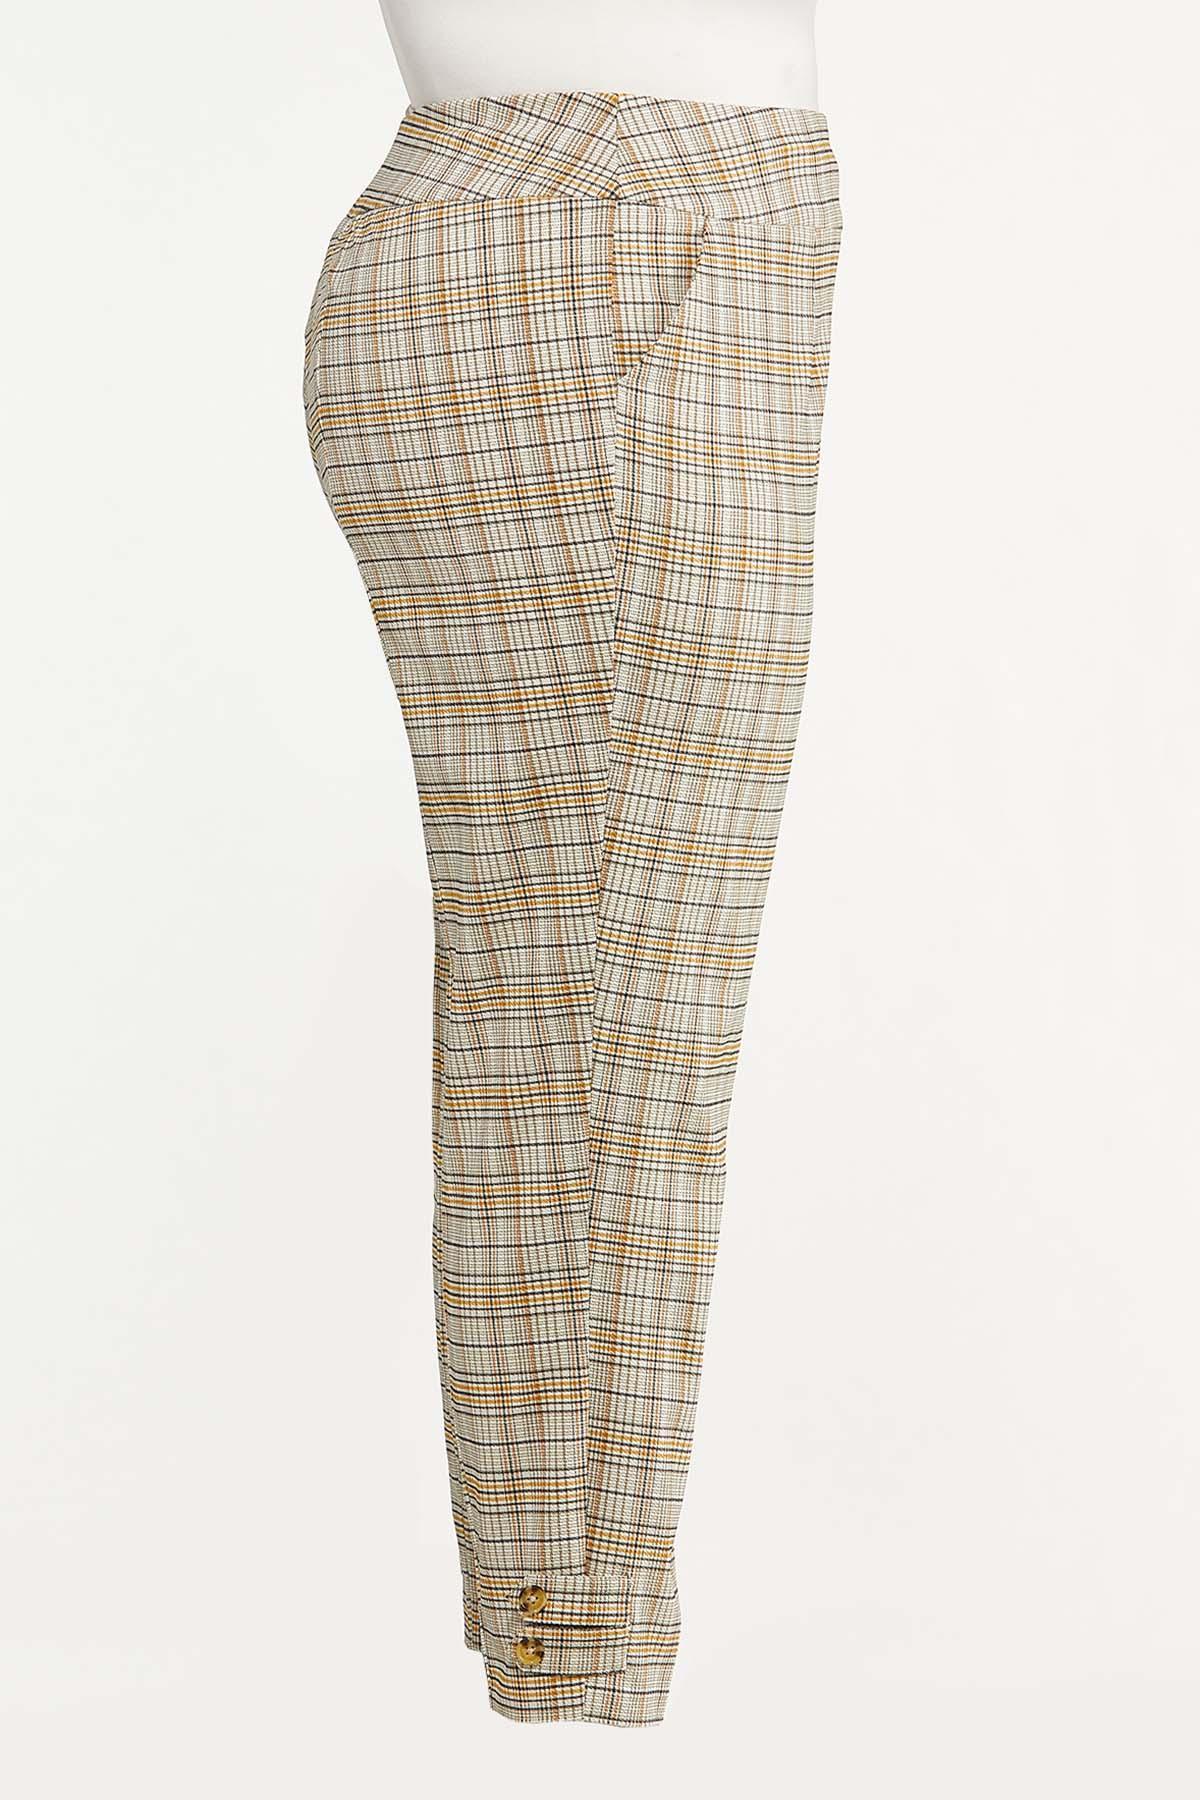 Plus Size Gold Bengaline Pants (Item #44642018)